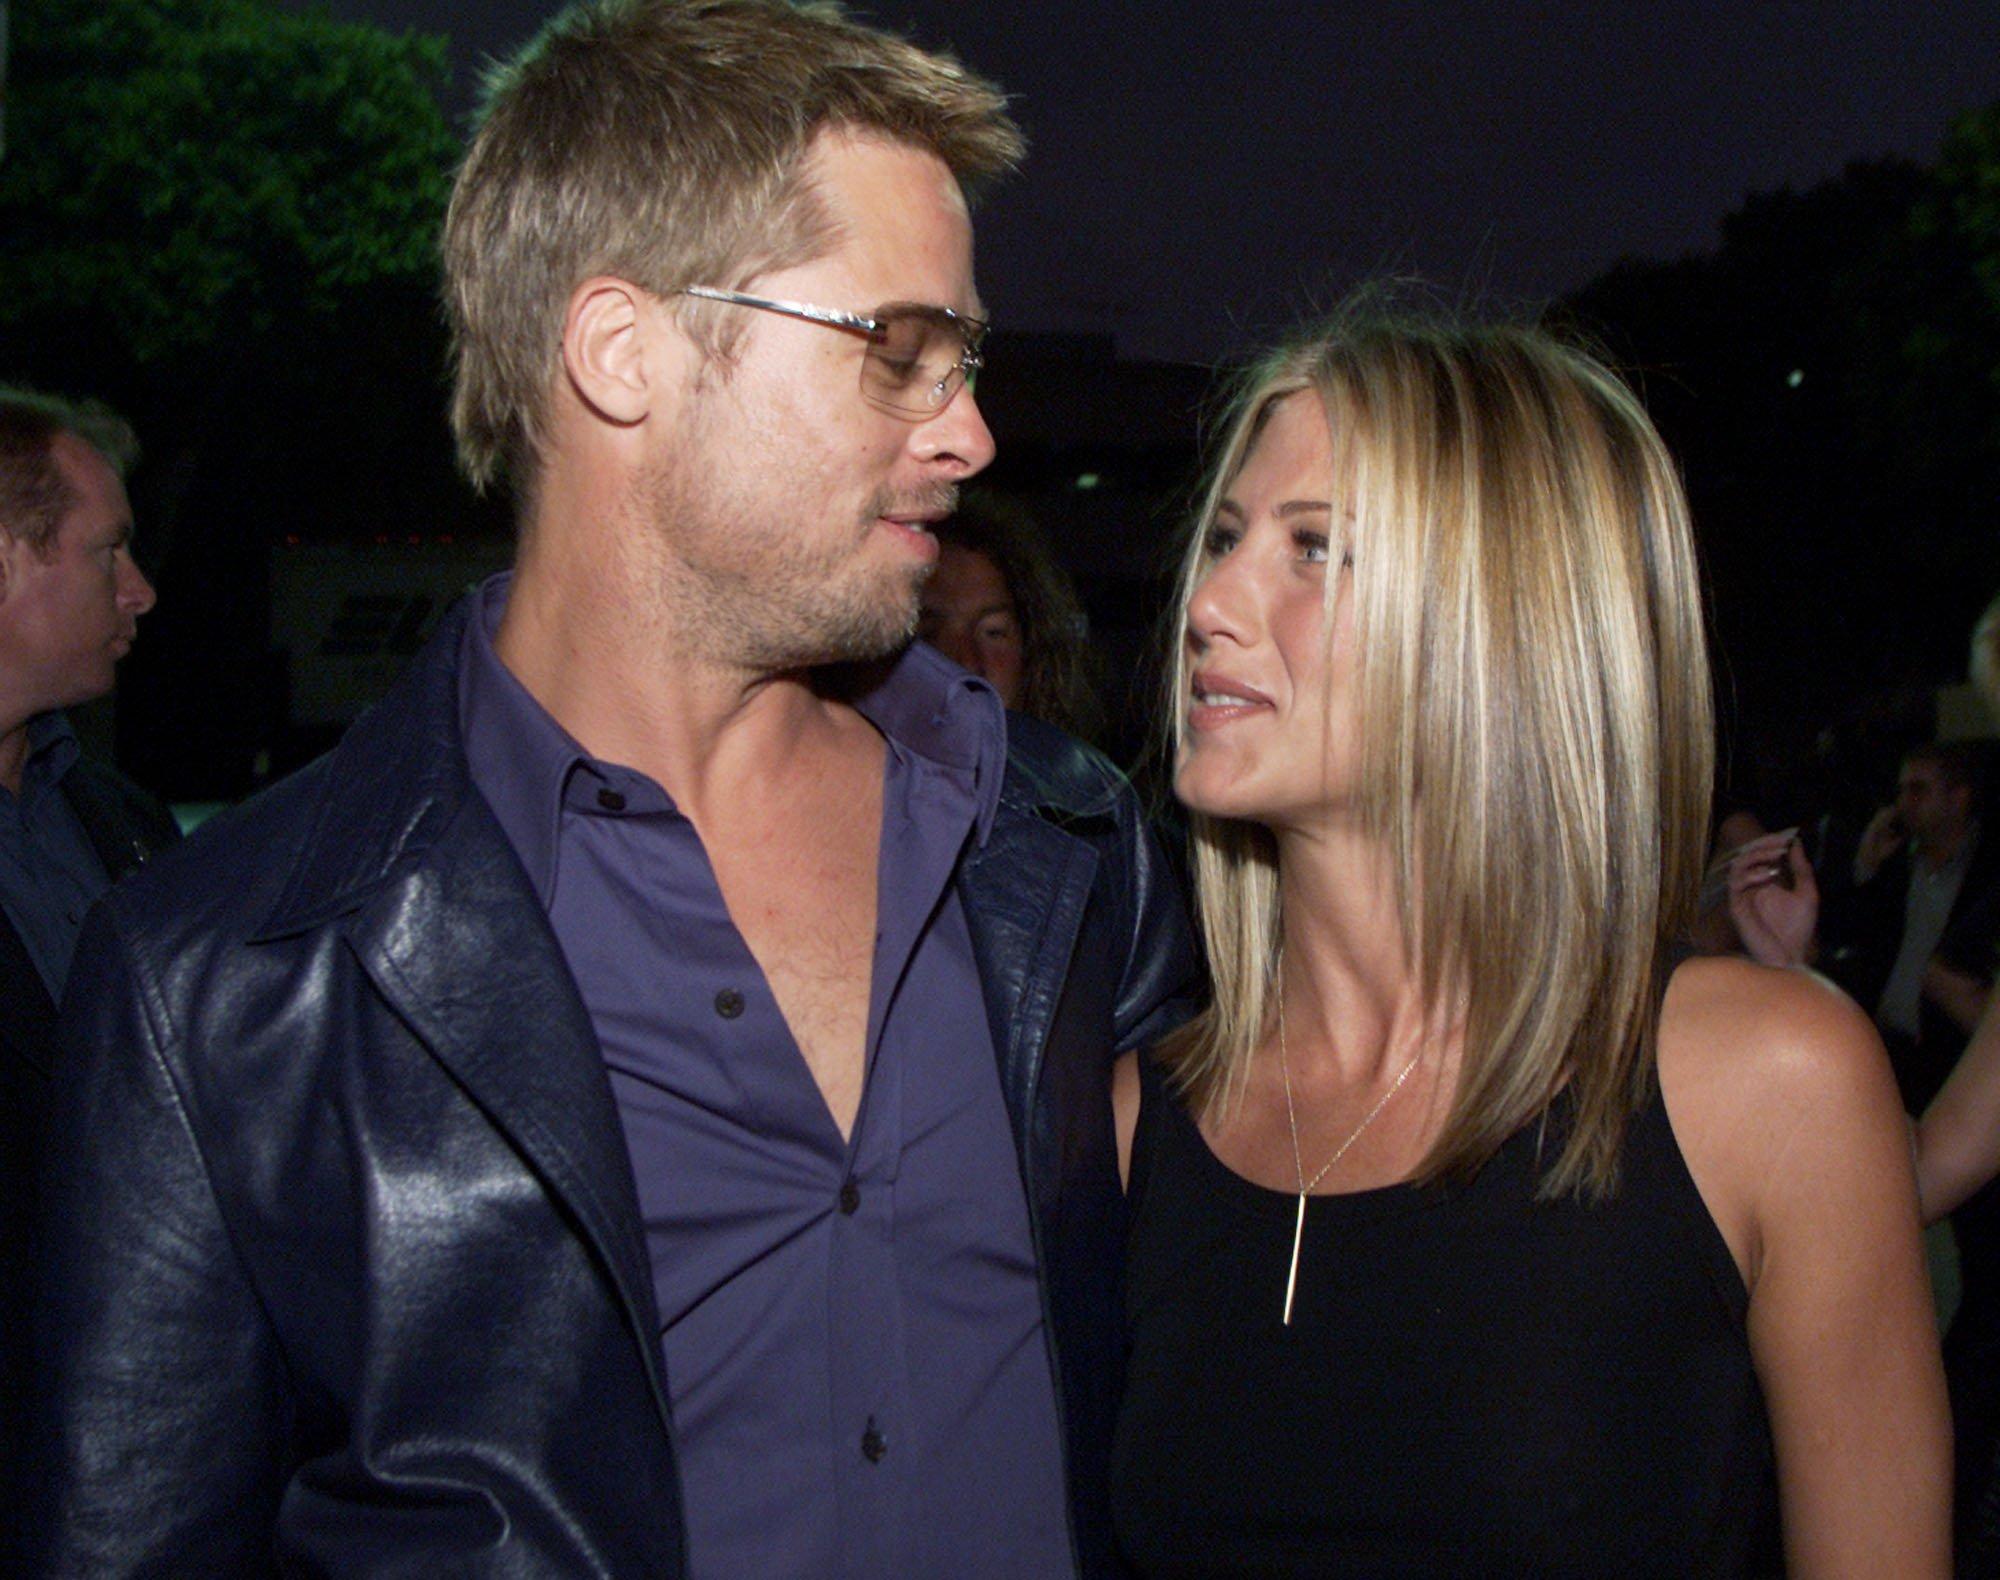 Brad Pitt and Jennifer Aniston in secret meeting?